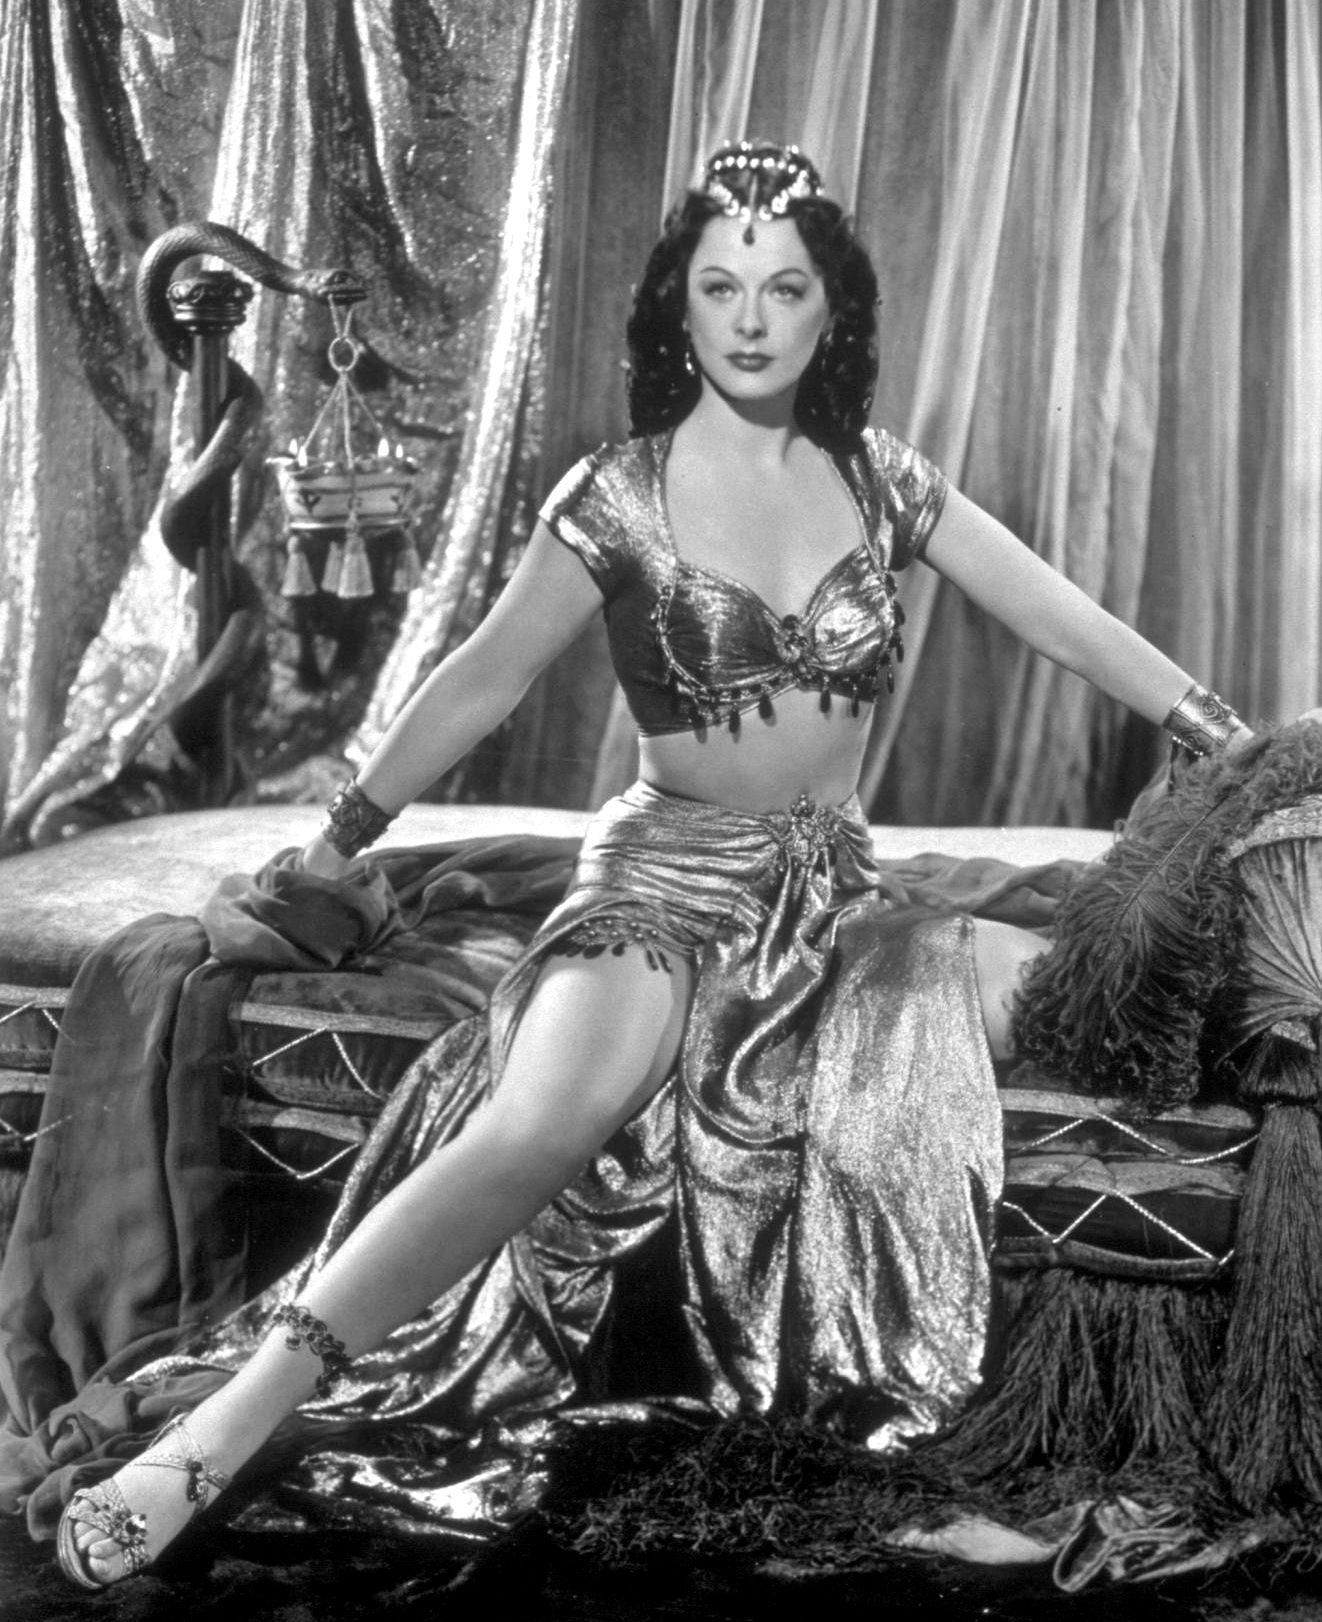 Hedy Lamarr as Delilah #classicactresses